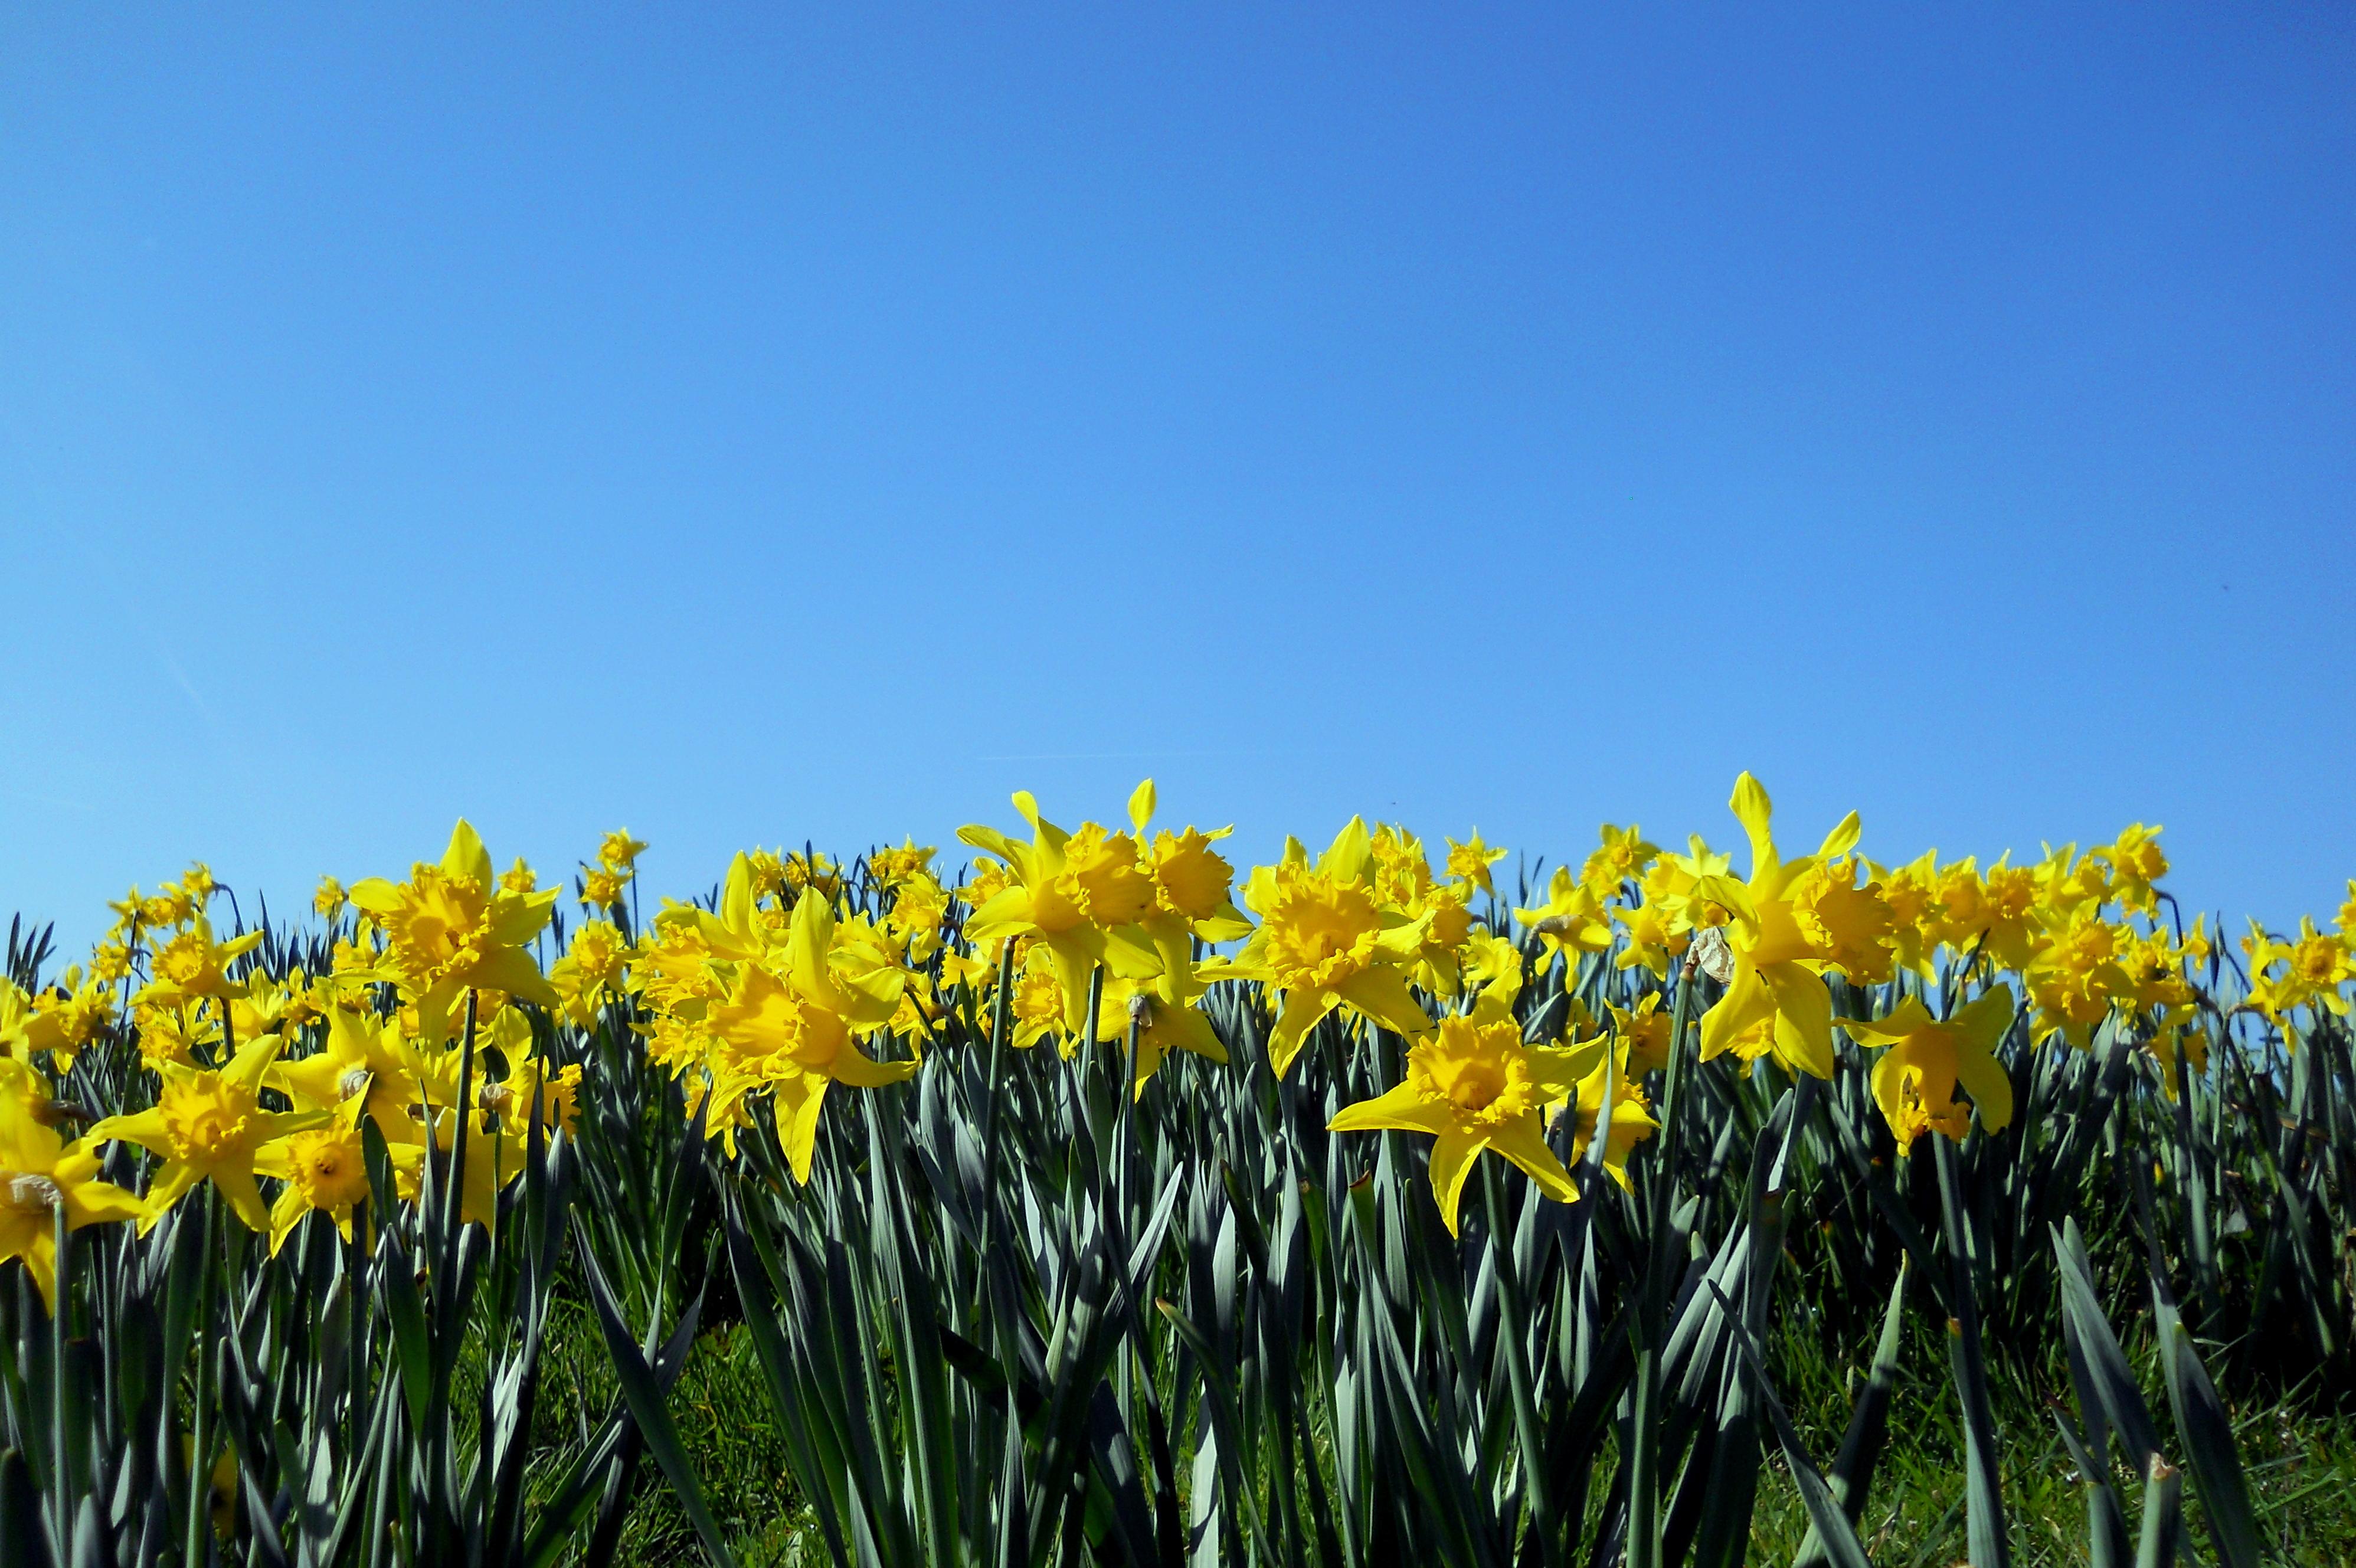 Hd 3d Nature Wallpapers 1080p Widescreen Daffodil Wallpaper Free Download Pixelstalk Net